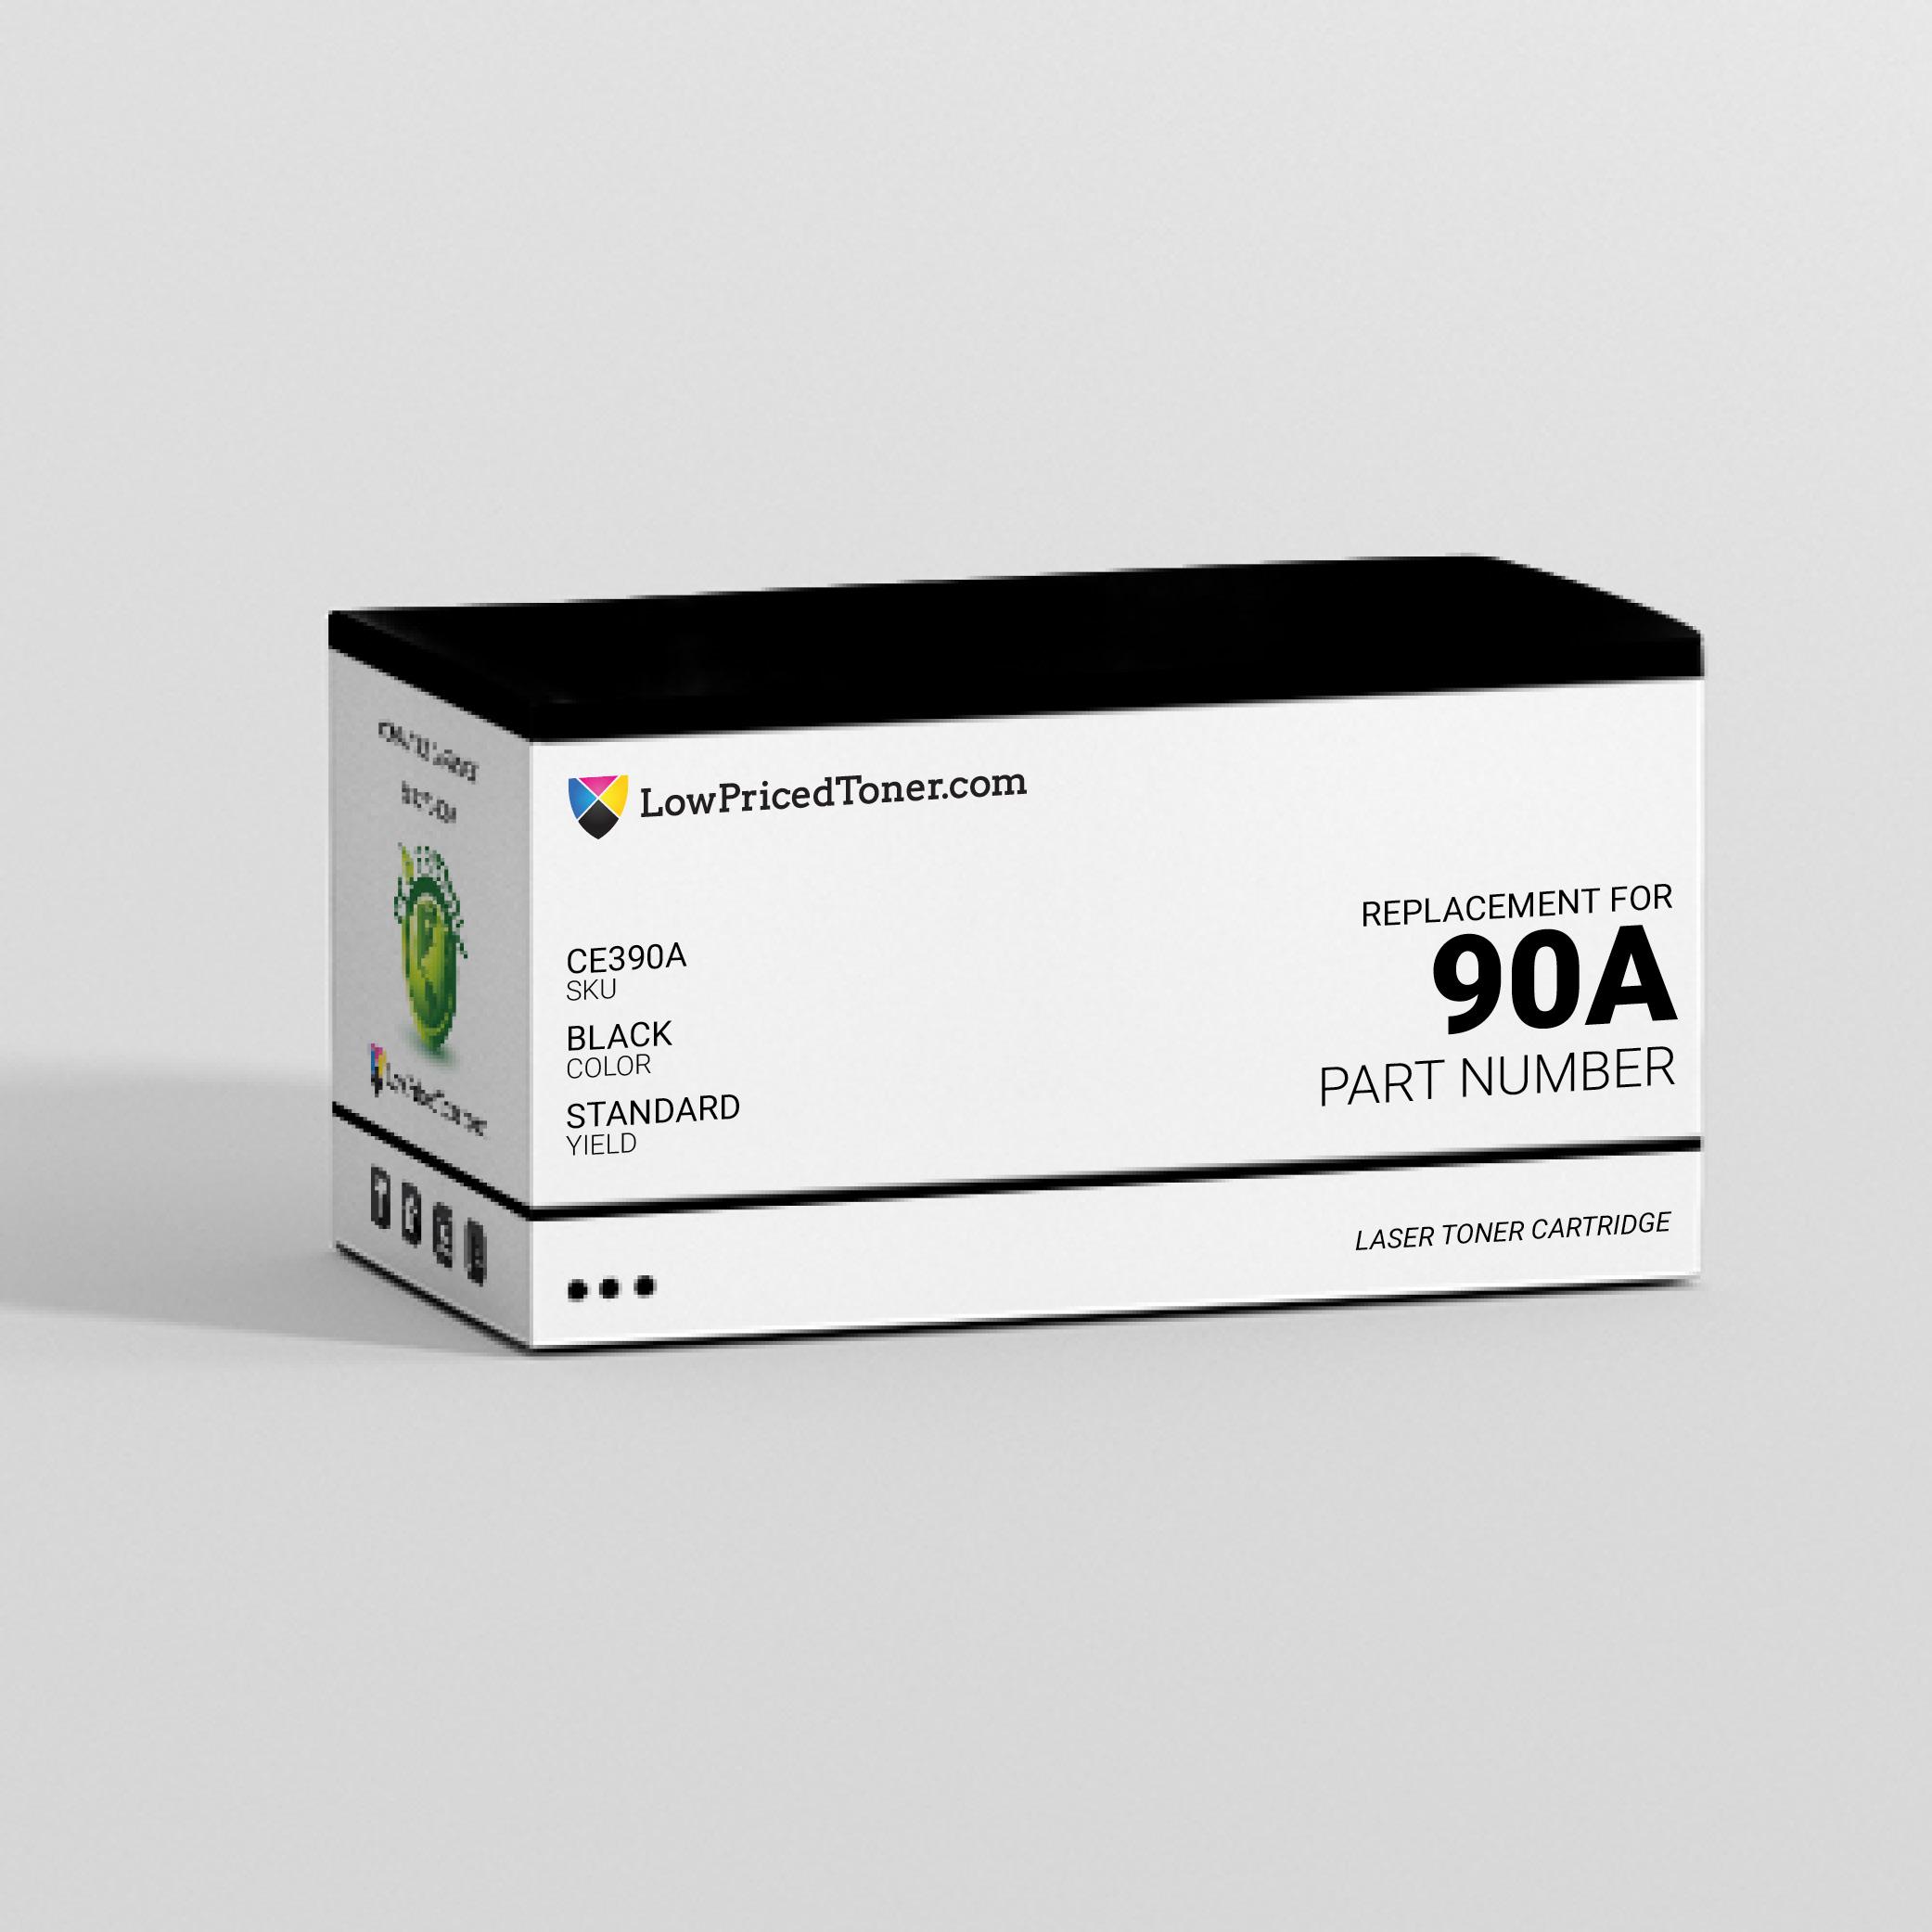 HP CE390A 90A Compatible Black Laser Toner Cartridge